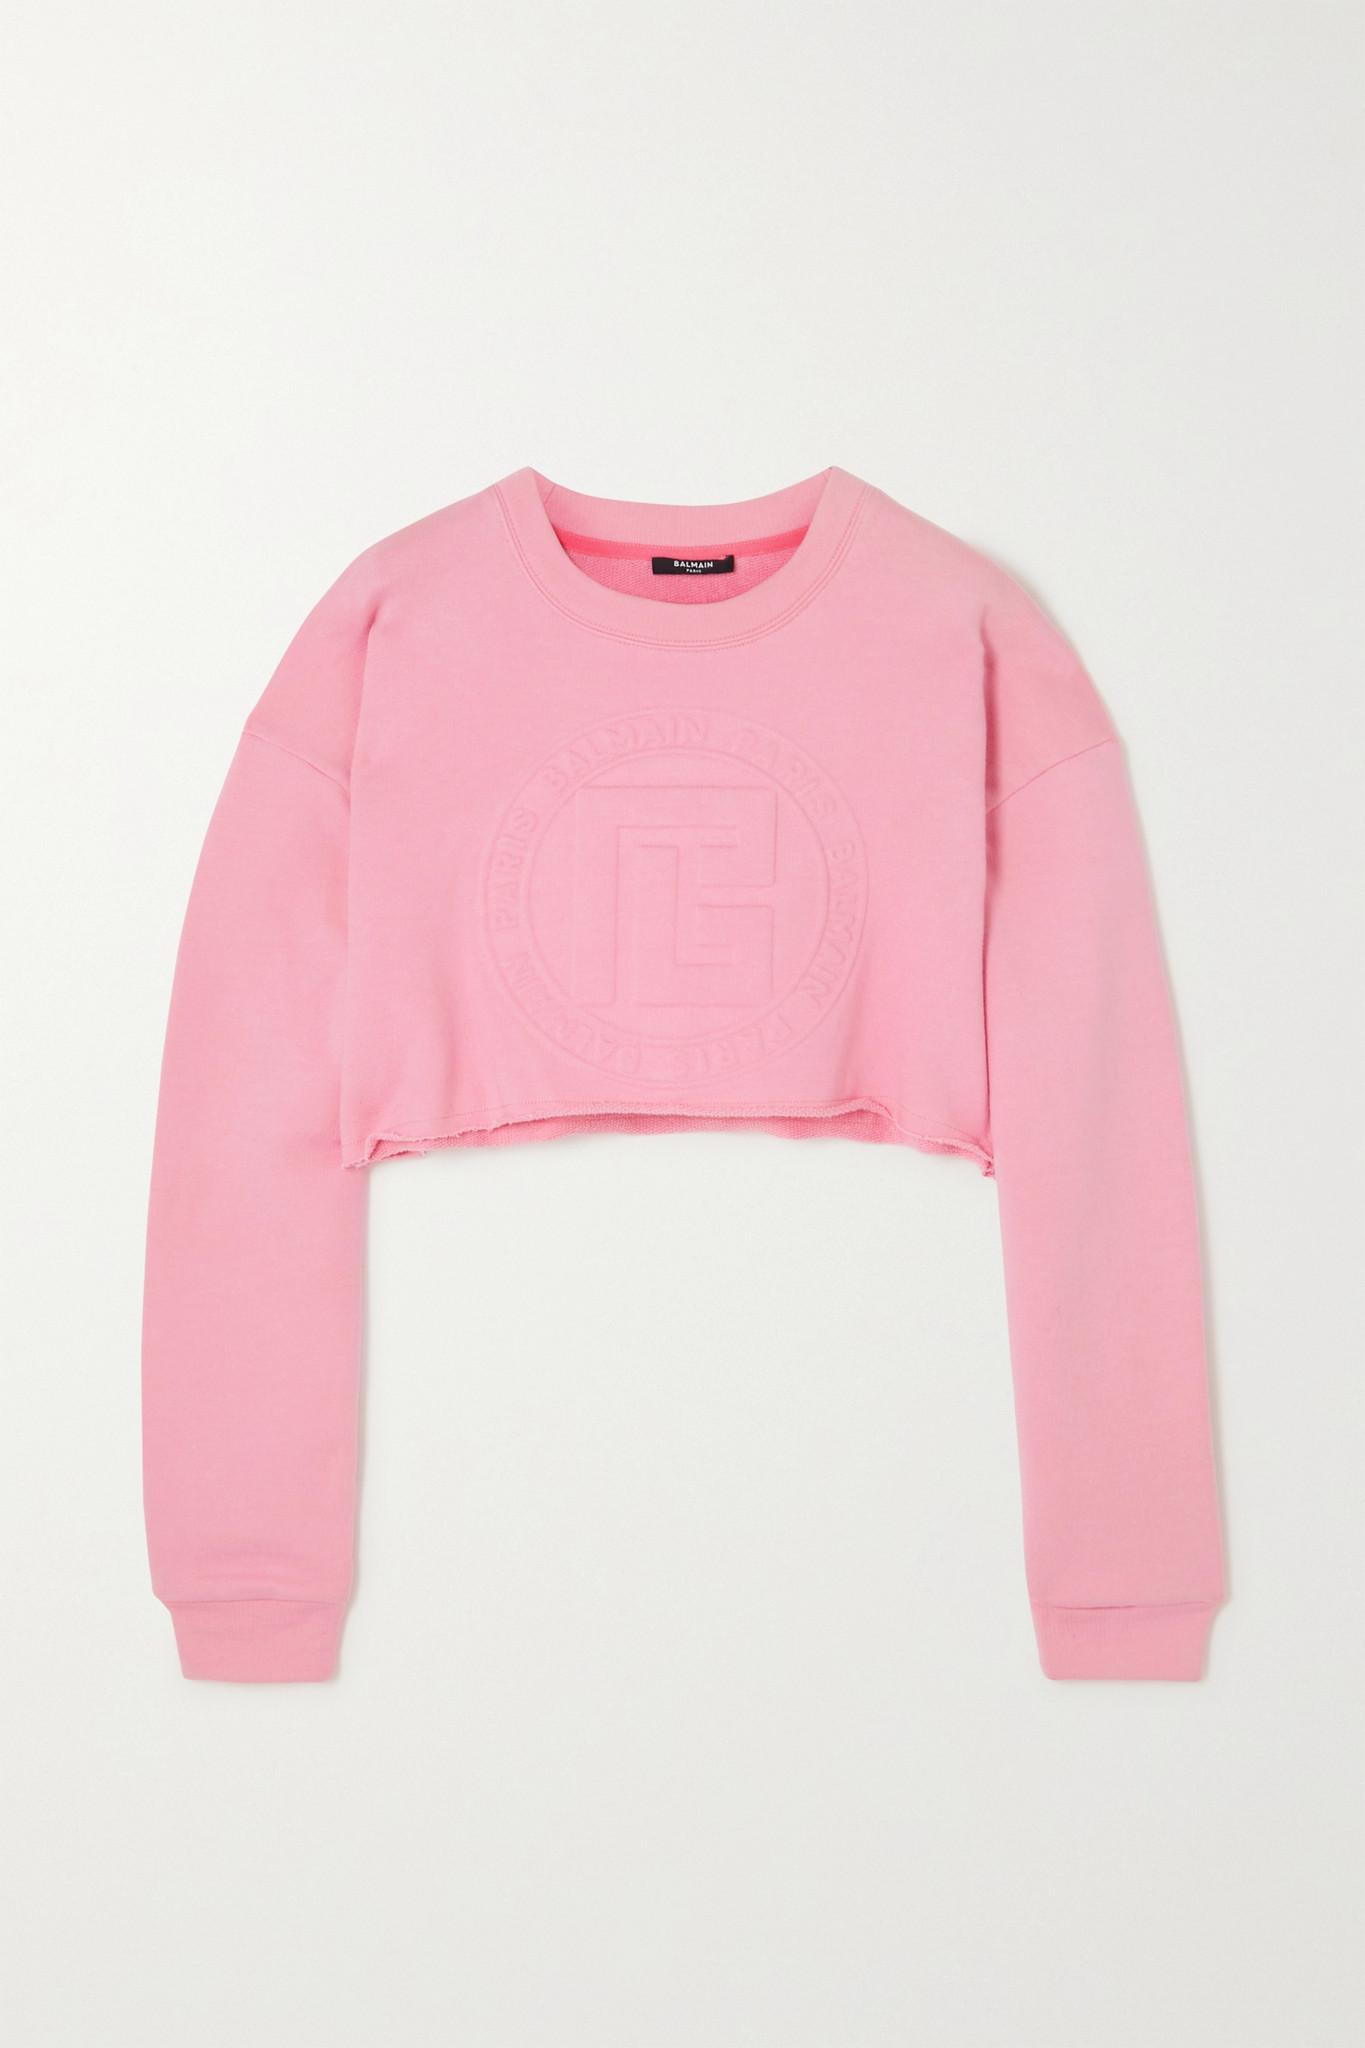 BALMAIN - 压花棉质羊绒混纺短款卫衣 - 粉红色 - small